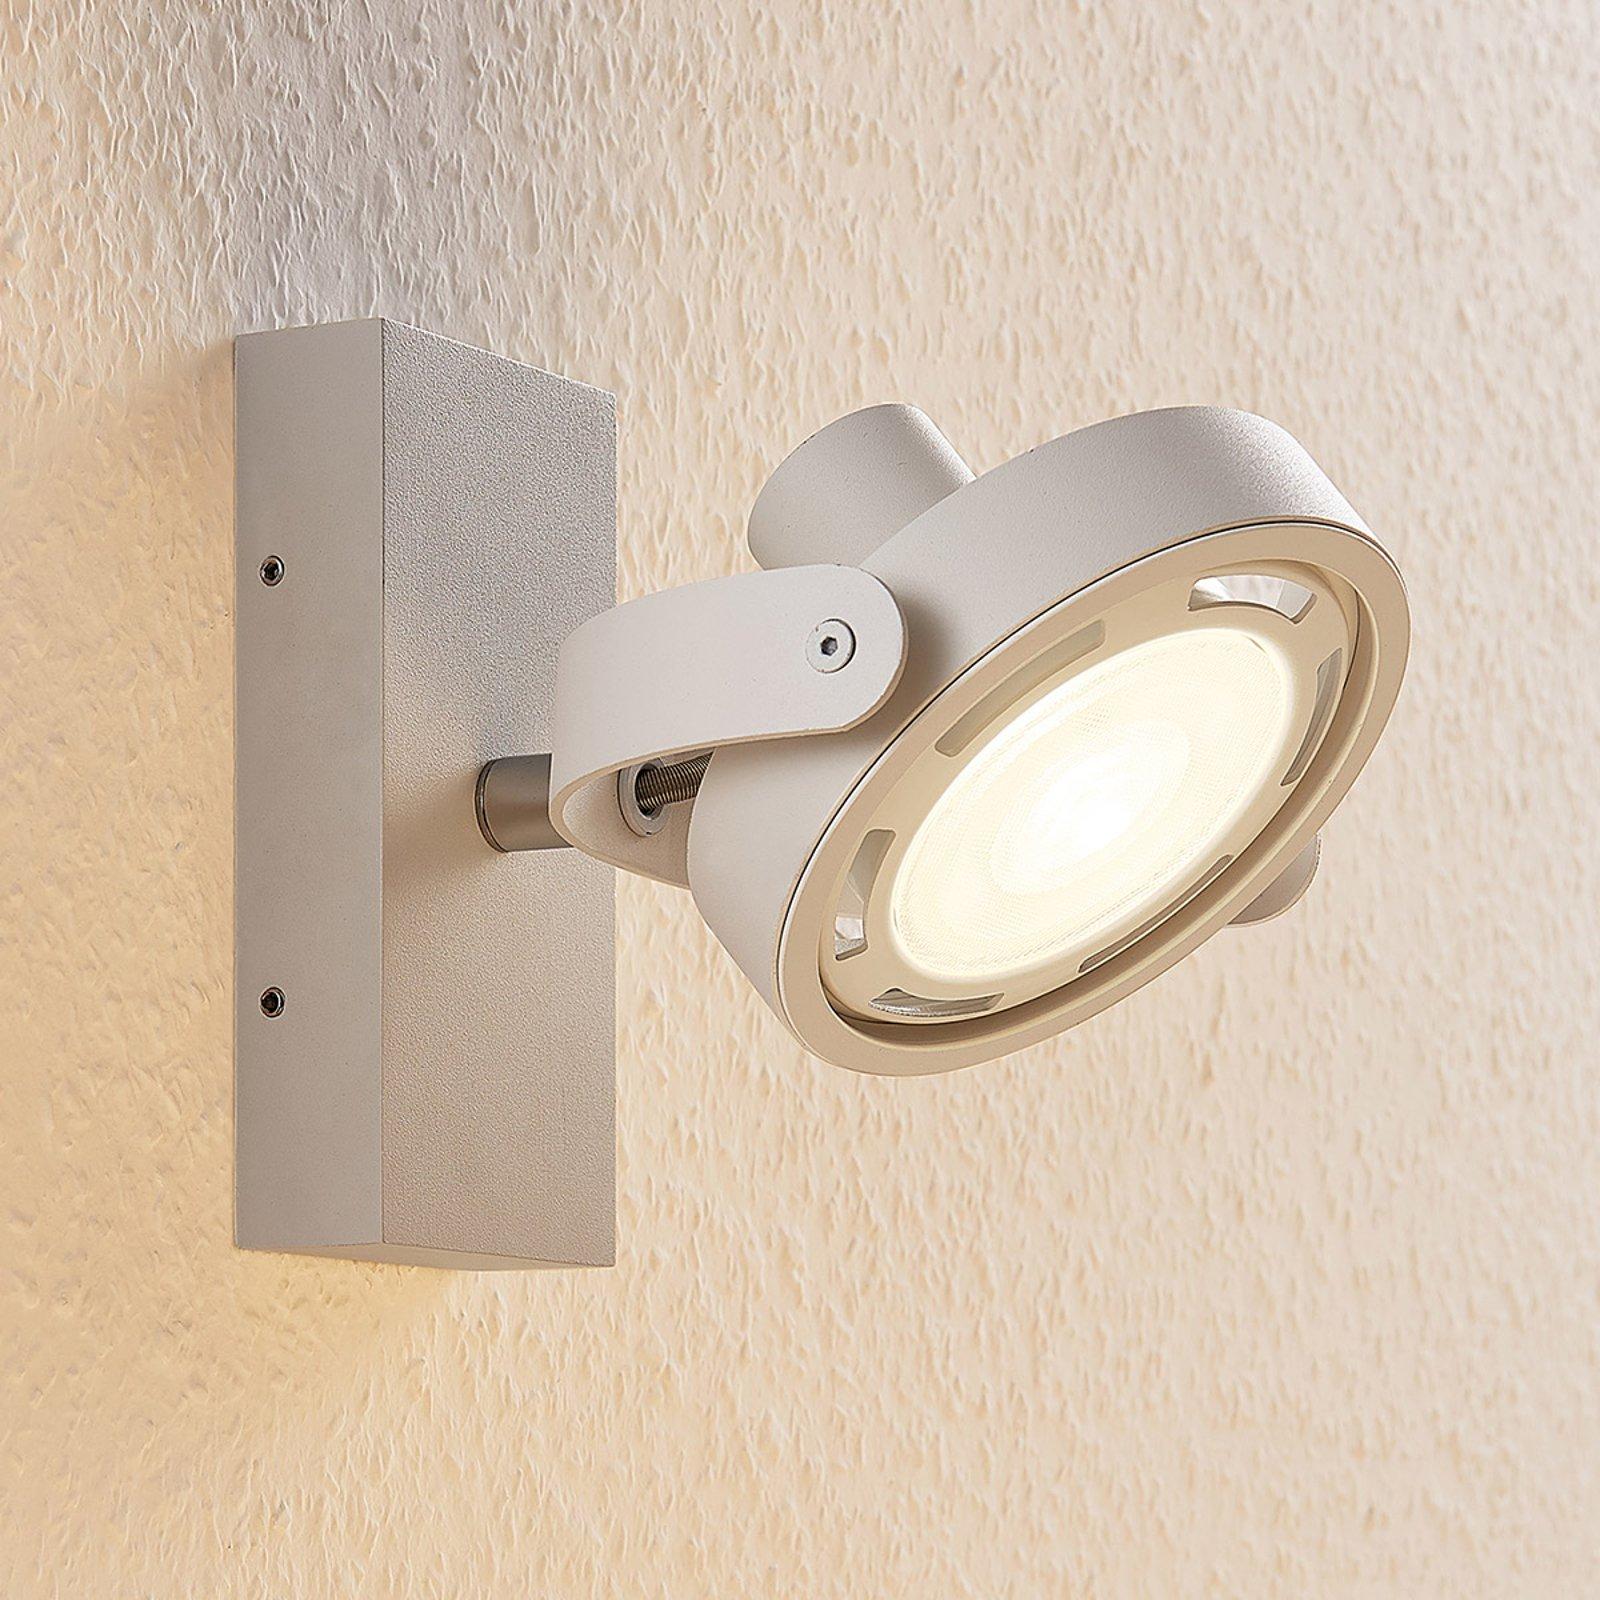 Munin LED-spot, dimbar, hvit, 1-lyskilde